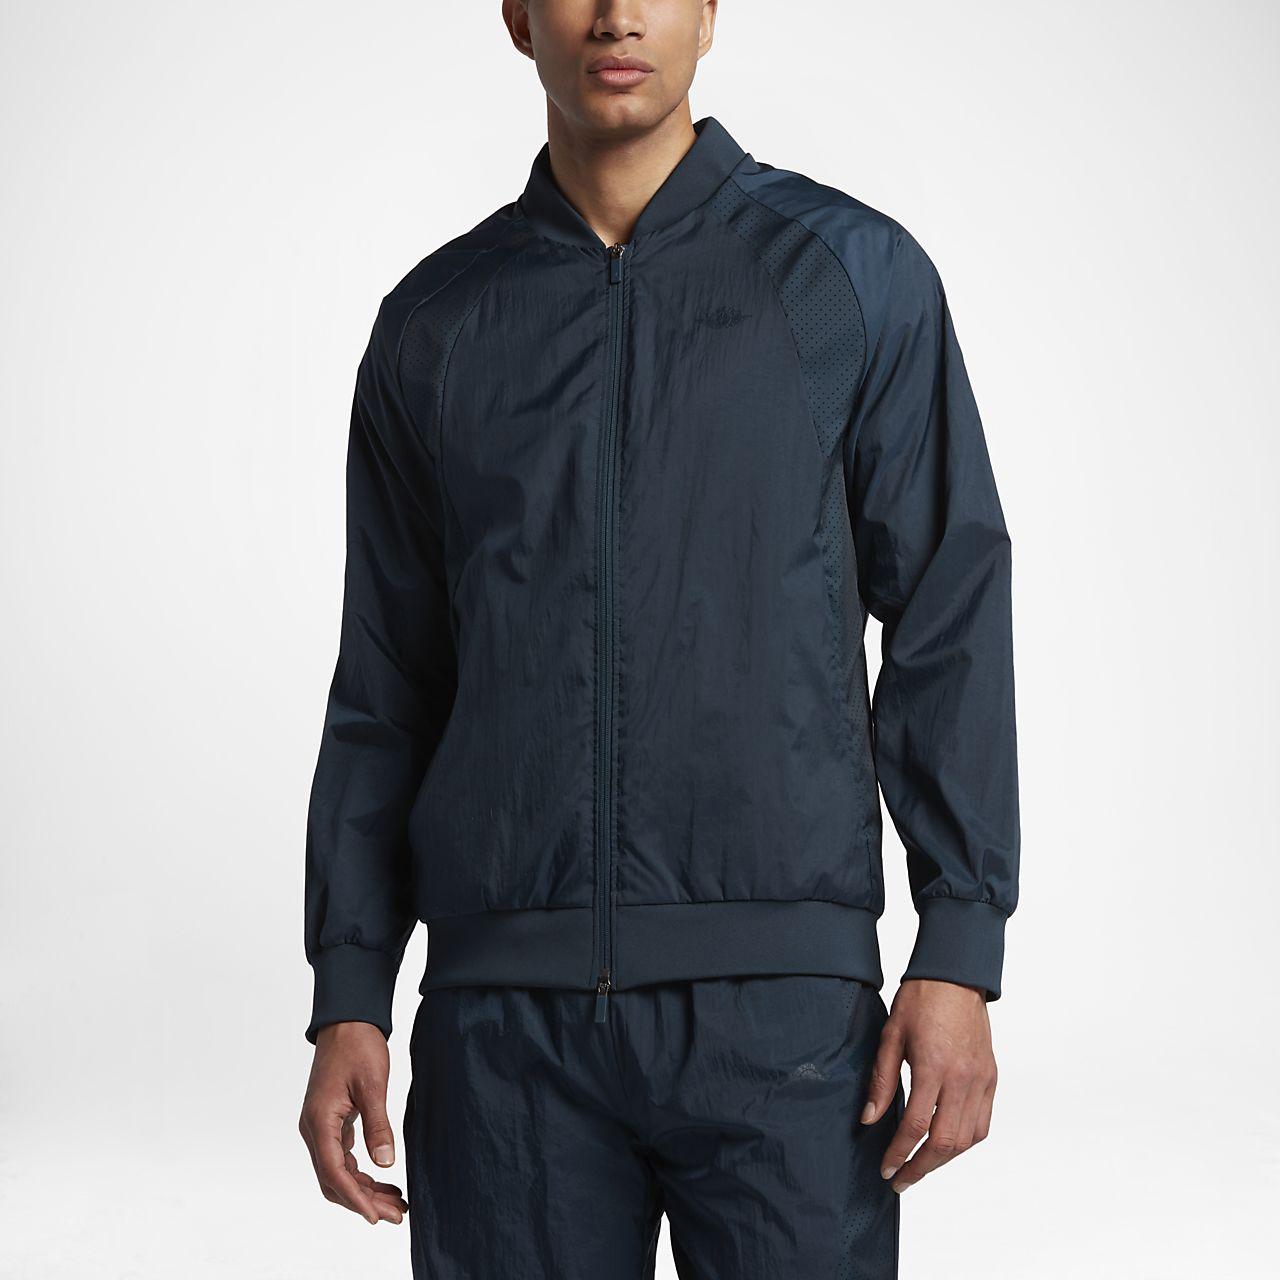 wholesale dealer 9b2a1 1235f ... Air Jordan Wings Woven Men s Jacket